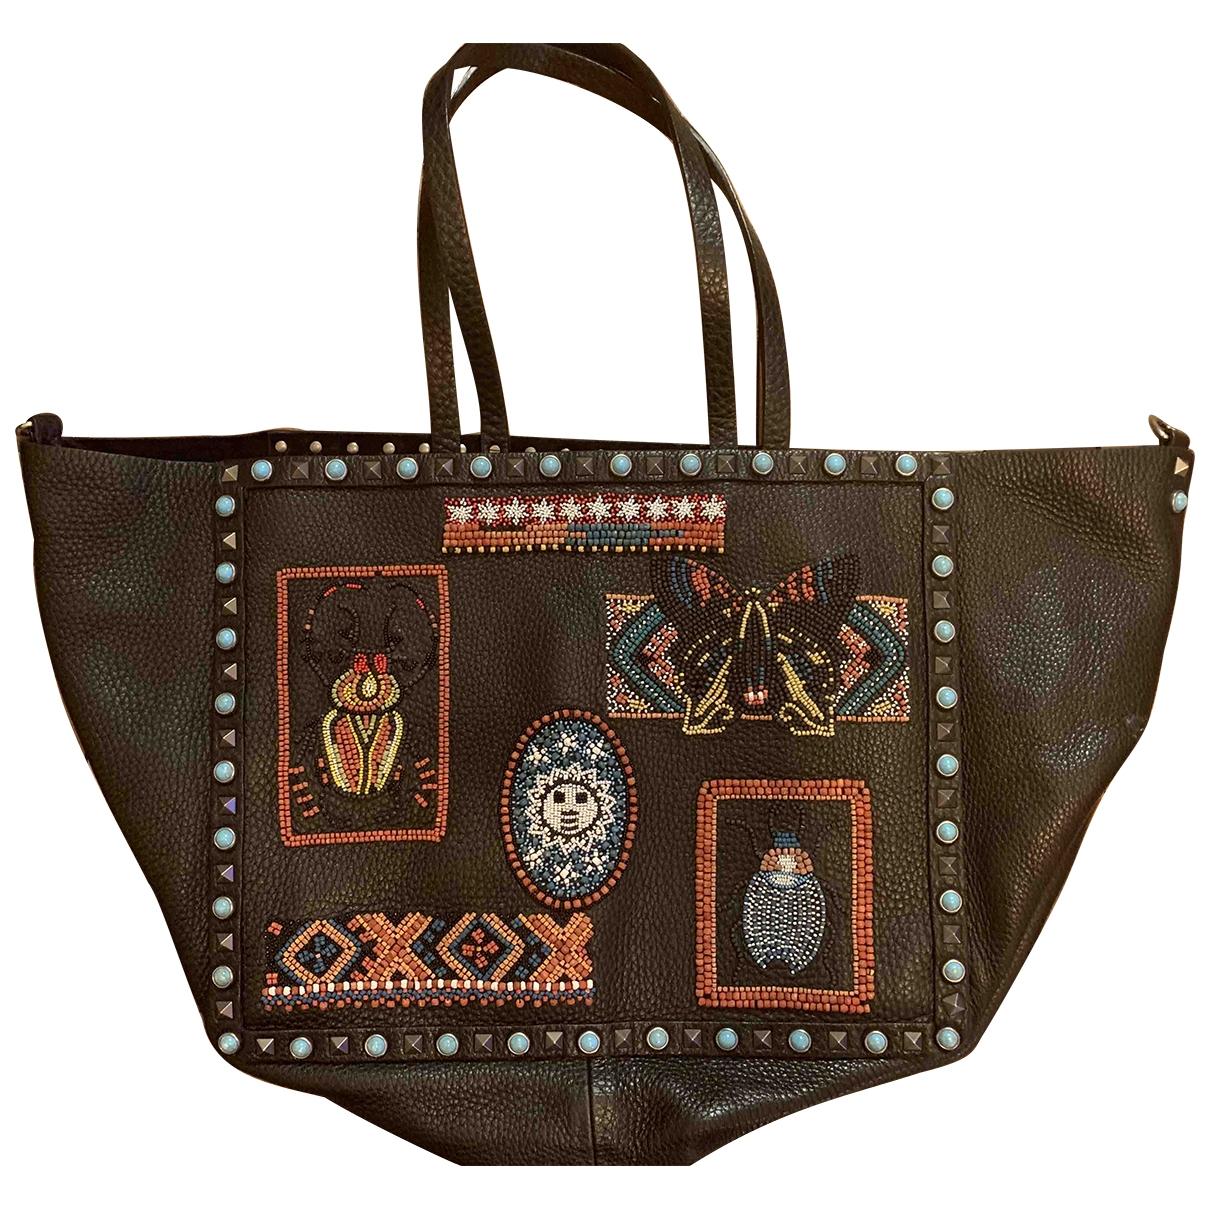 Valentino Garavani Rockstud Brown Leather handbag for Women \N